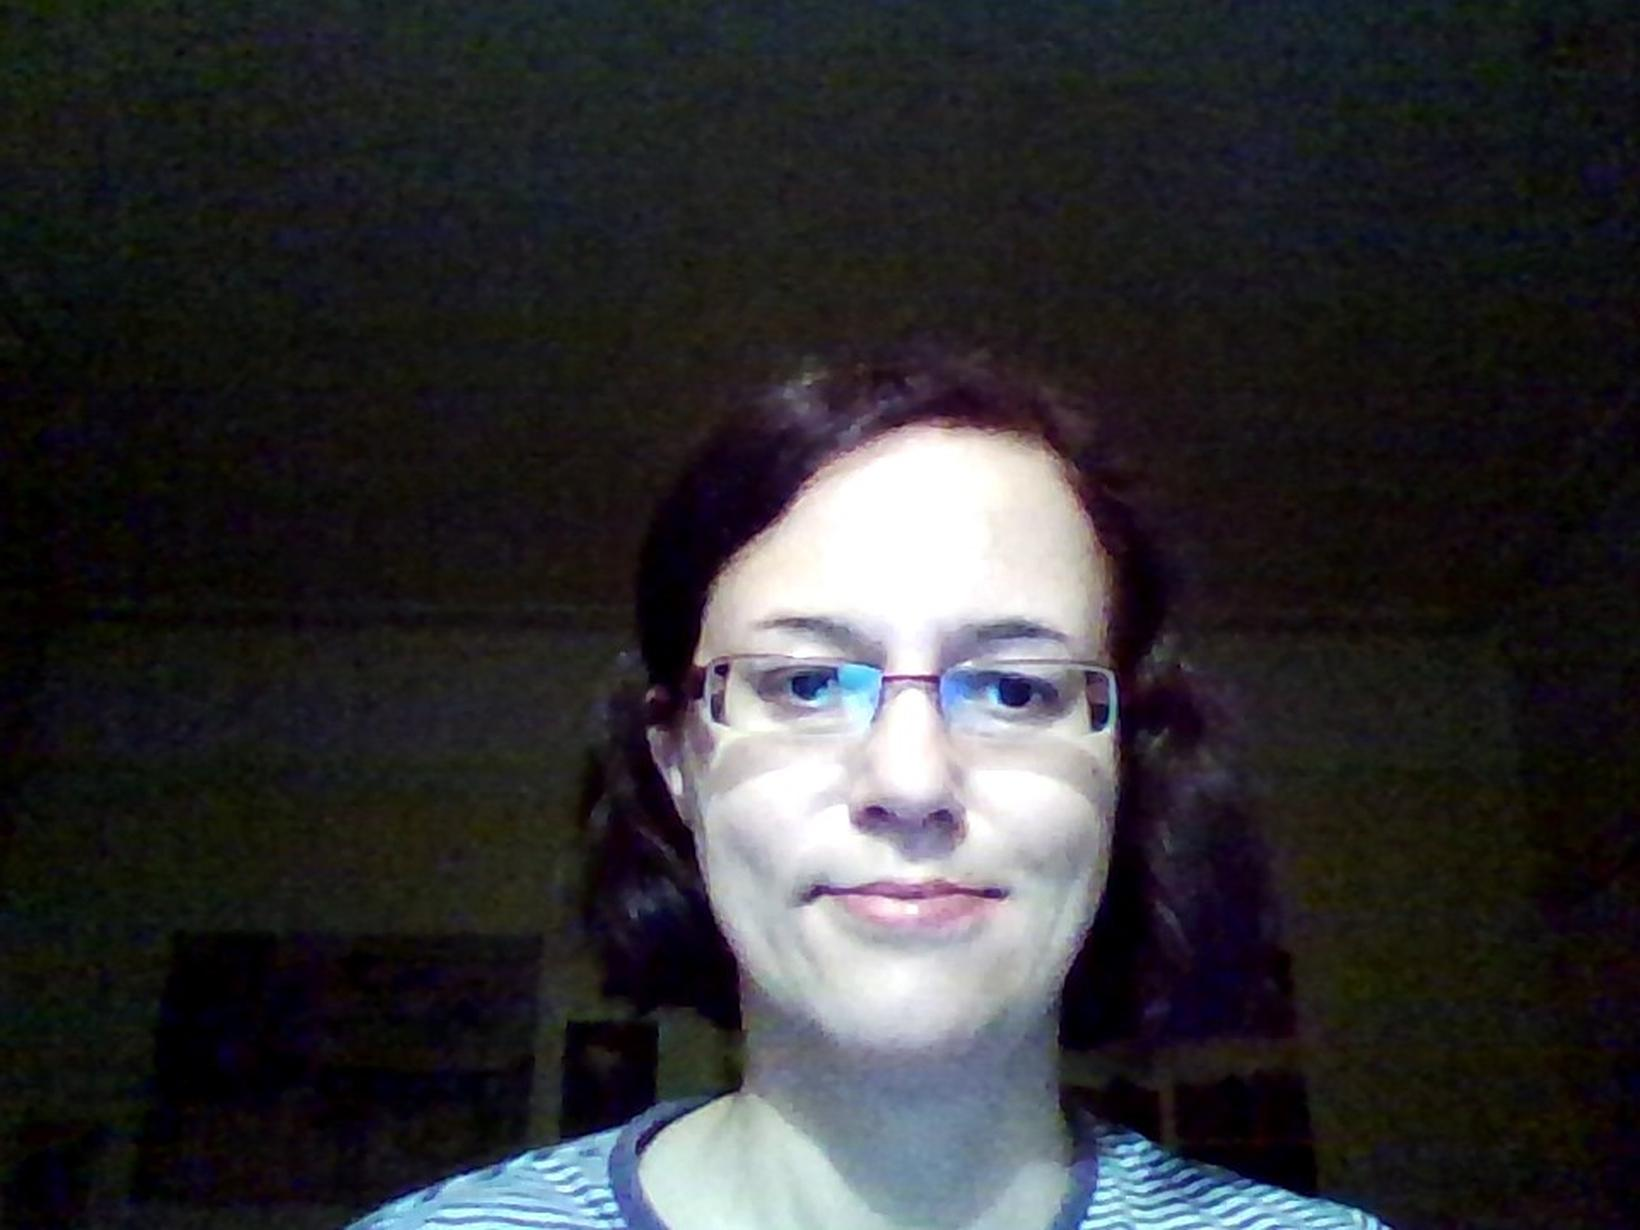 Denise from London, United Kingdom